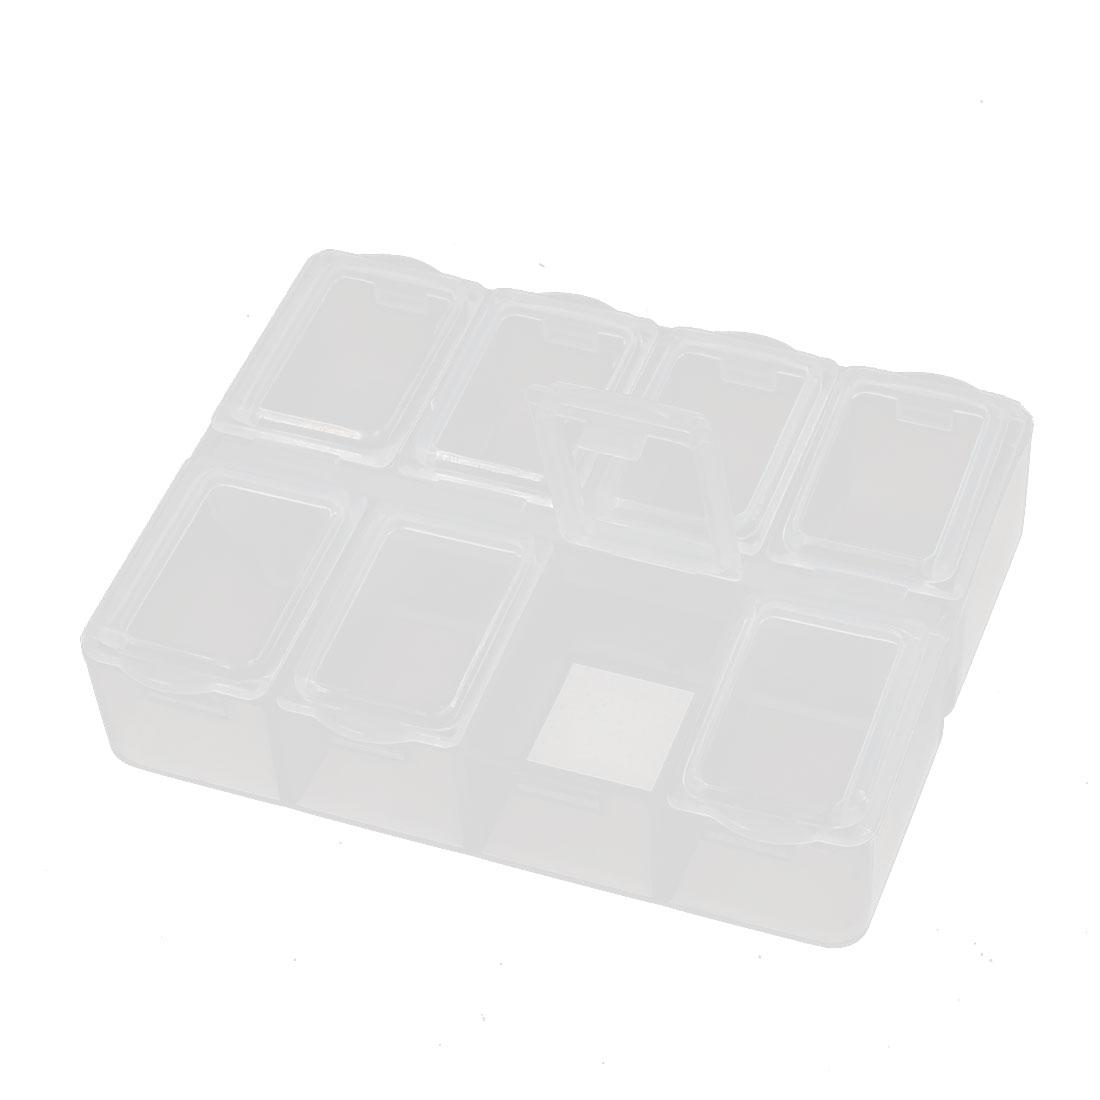 Desktop Tool Part Hardware Plastic Adjustable Storage Sorter Case Box Organizer